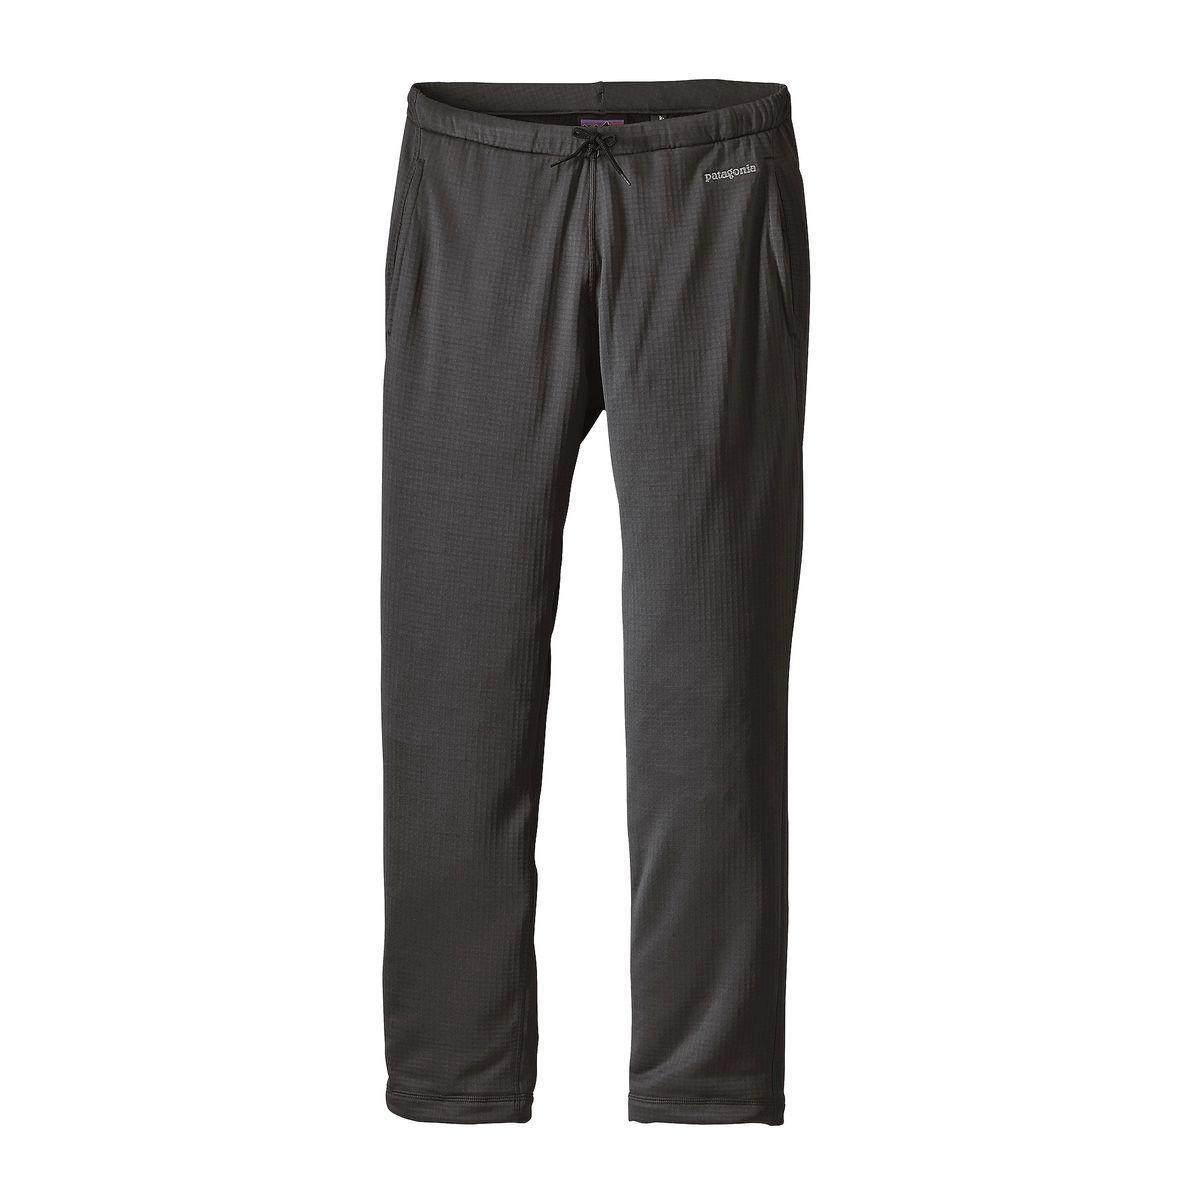 Mens r1 fleece pants fleece pants pants for women